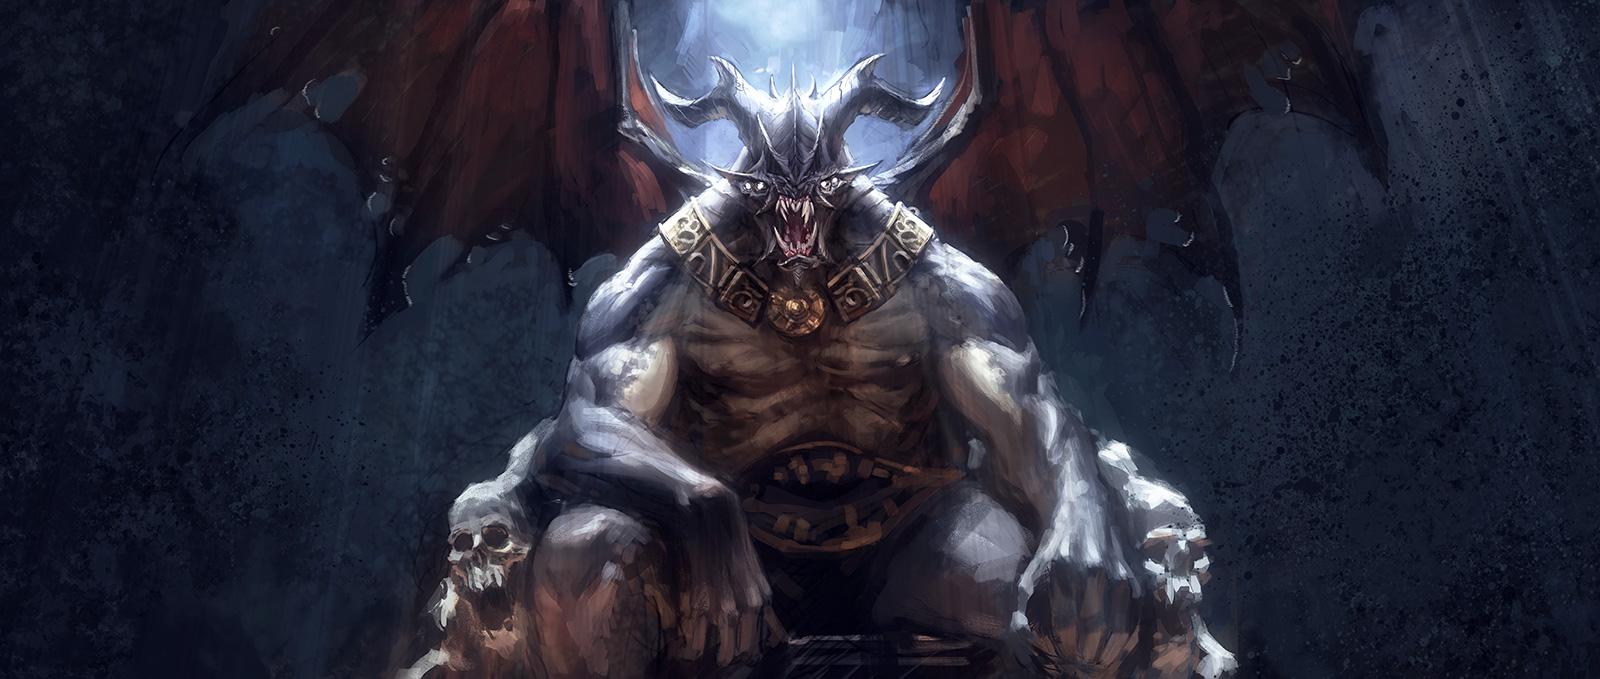 Biowares Online Action Game Delayed For Origin Integration Rumour VG247